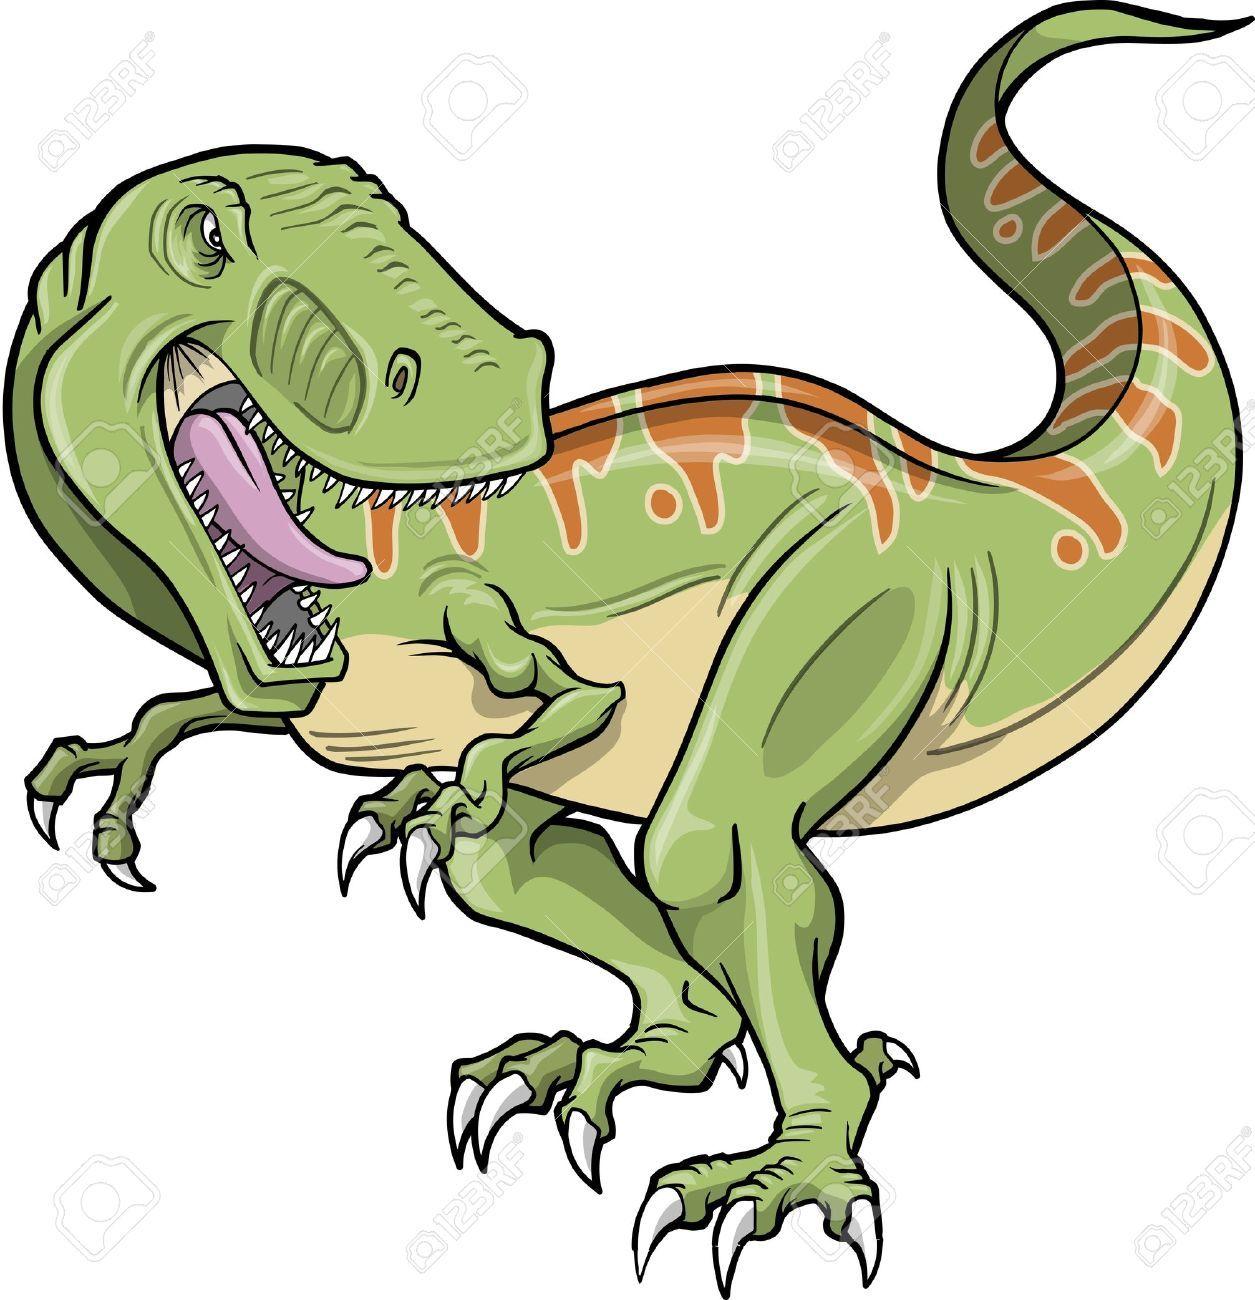 T rex dinosaurs clipart 6 » Clipart Portal.